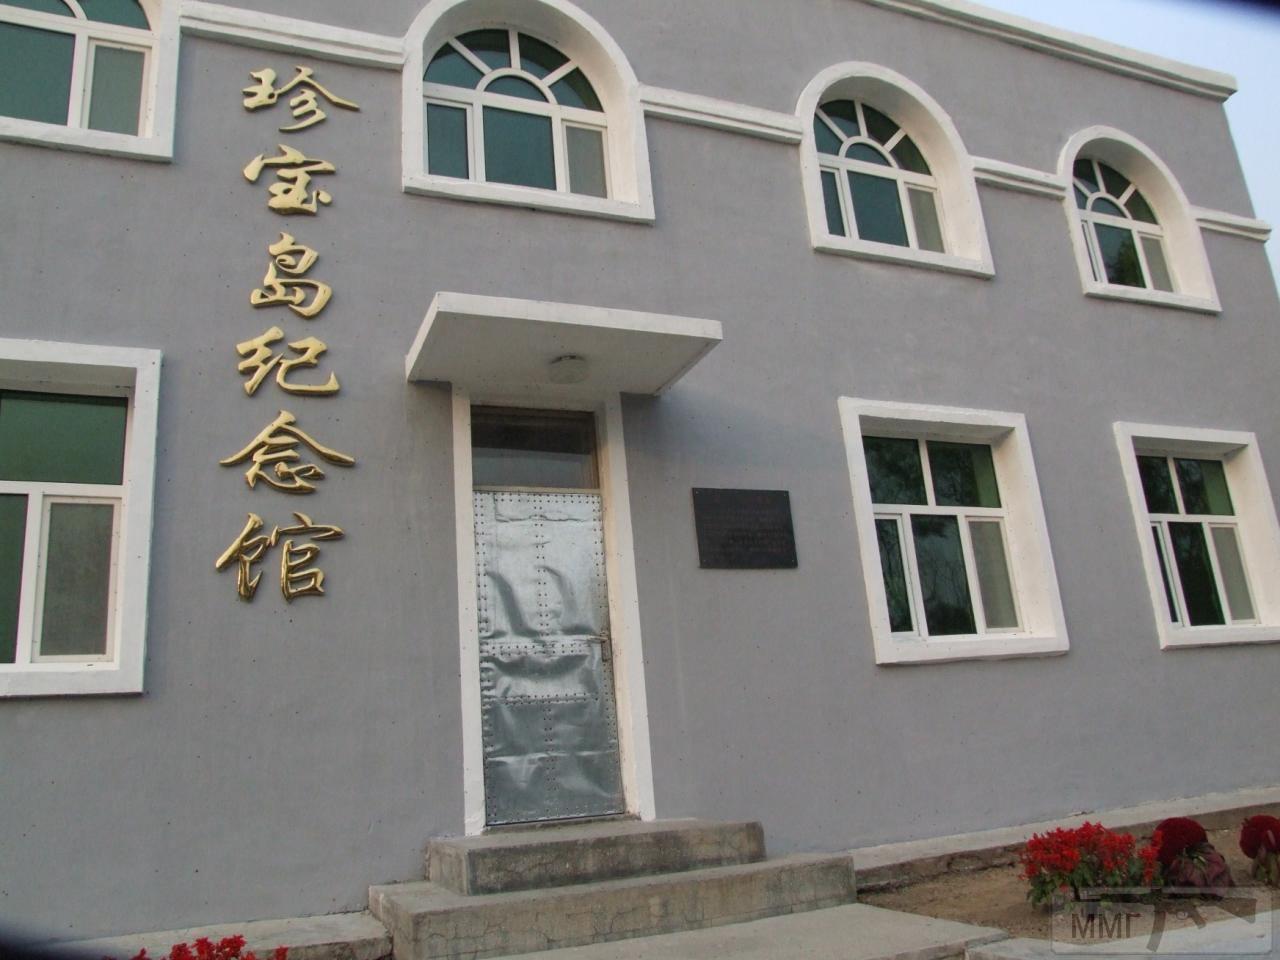 14089 - Вход в музей